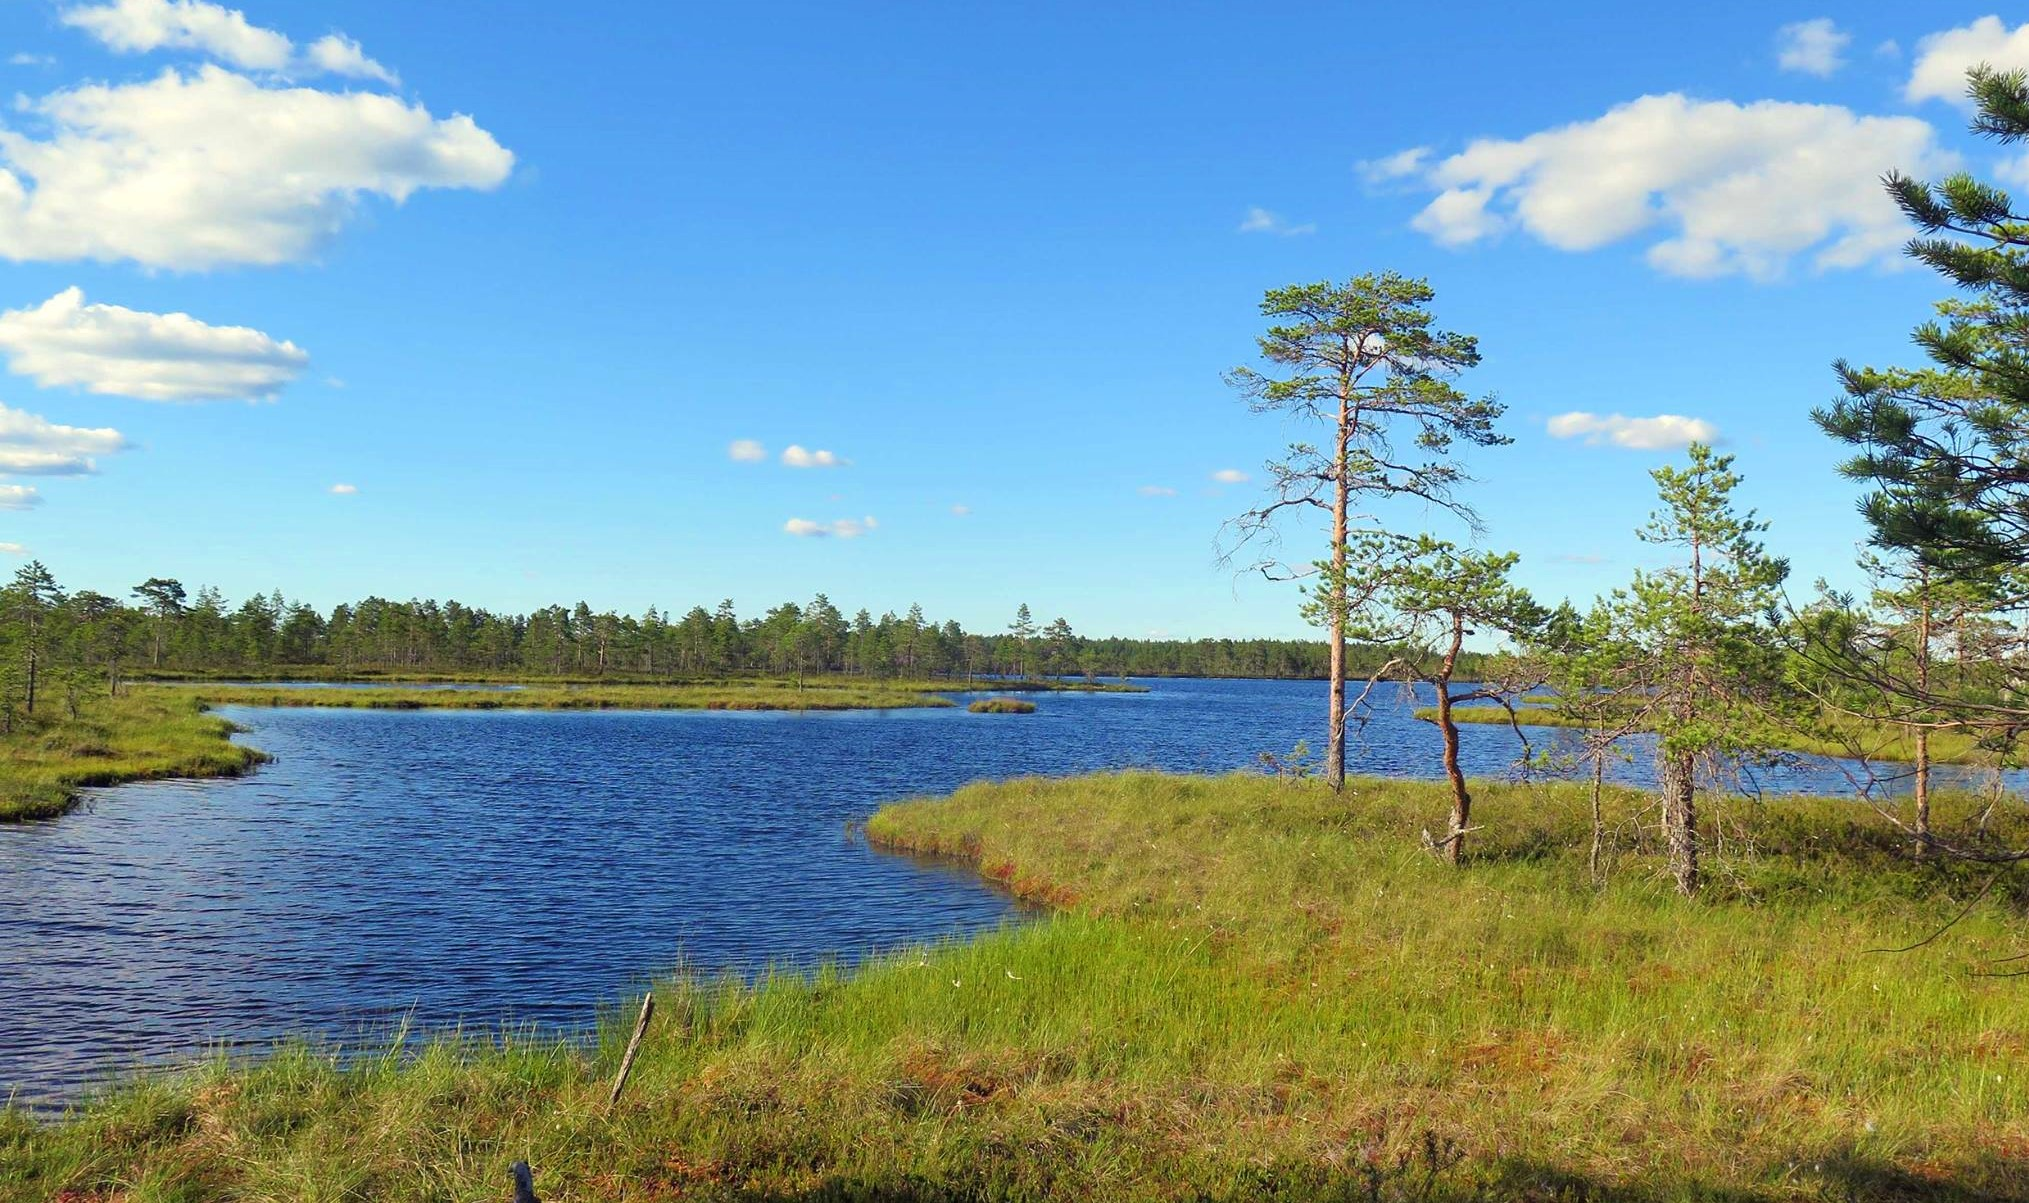 Kauhaneva-Pohjankangas National Park